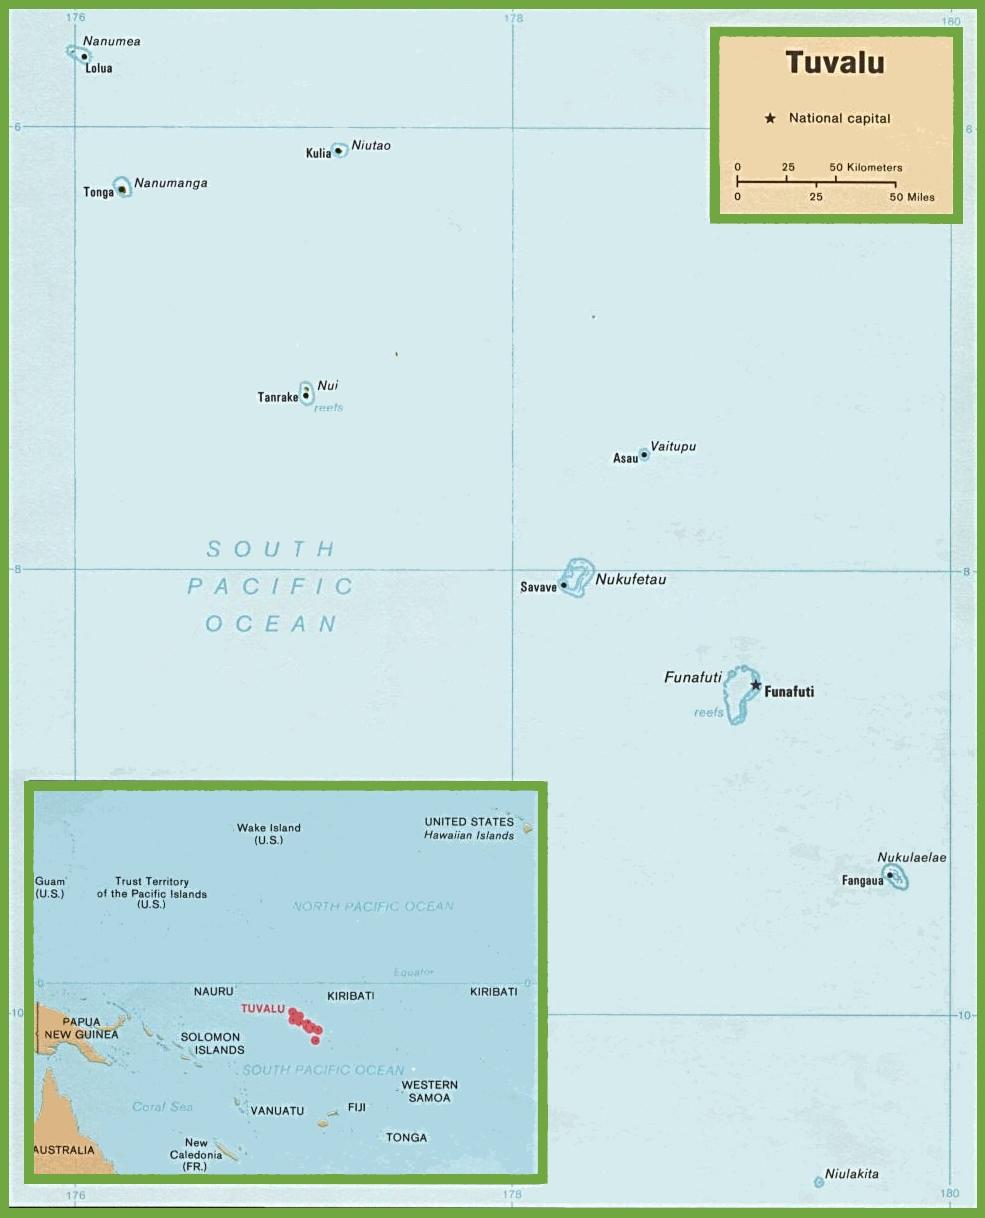 Tuvalu political map